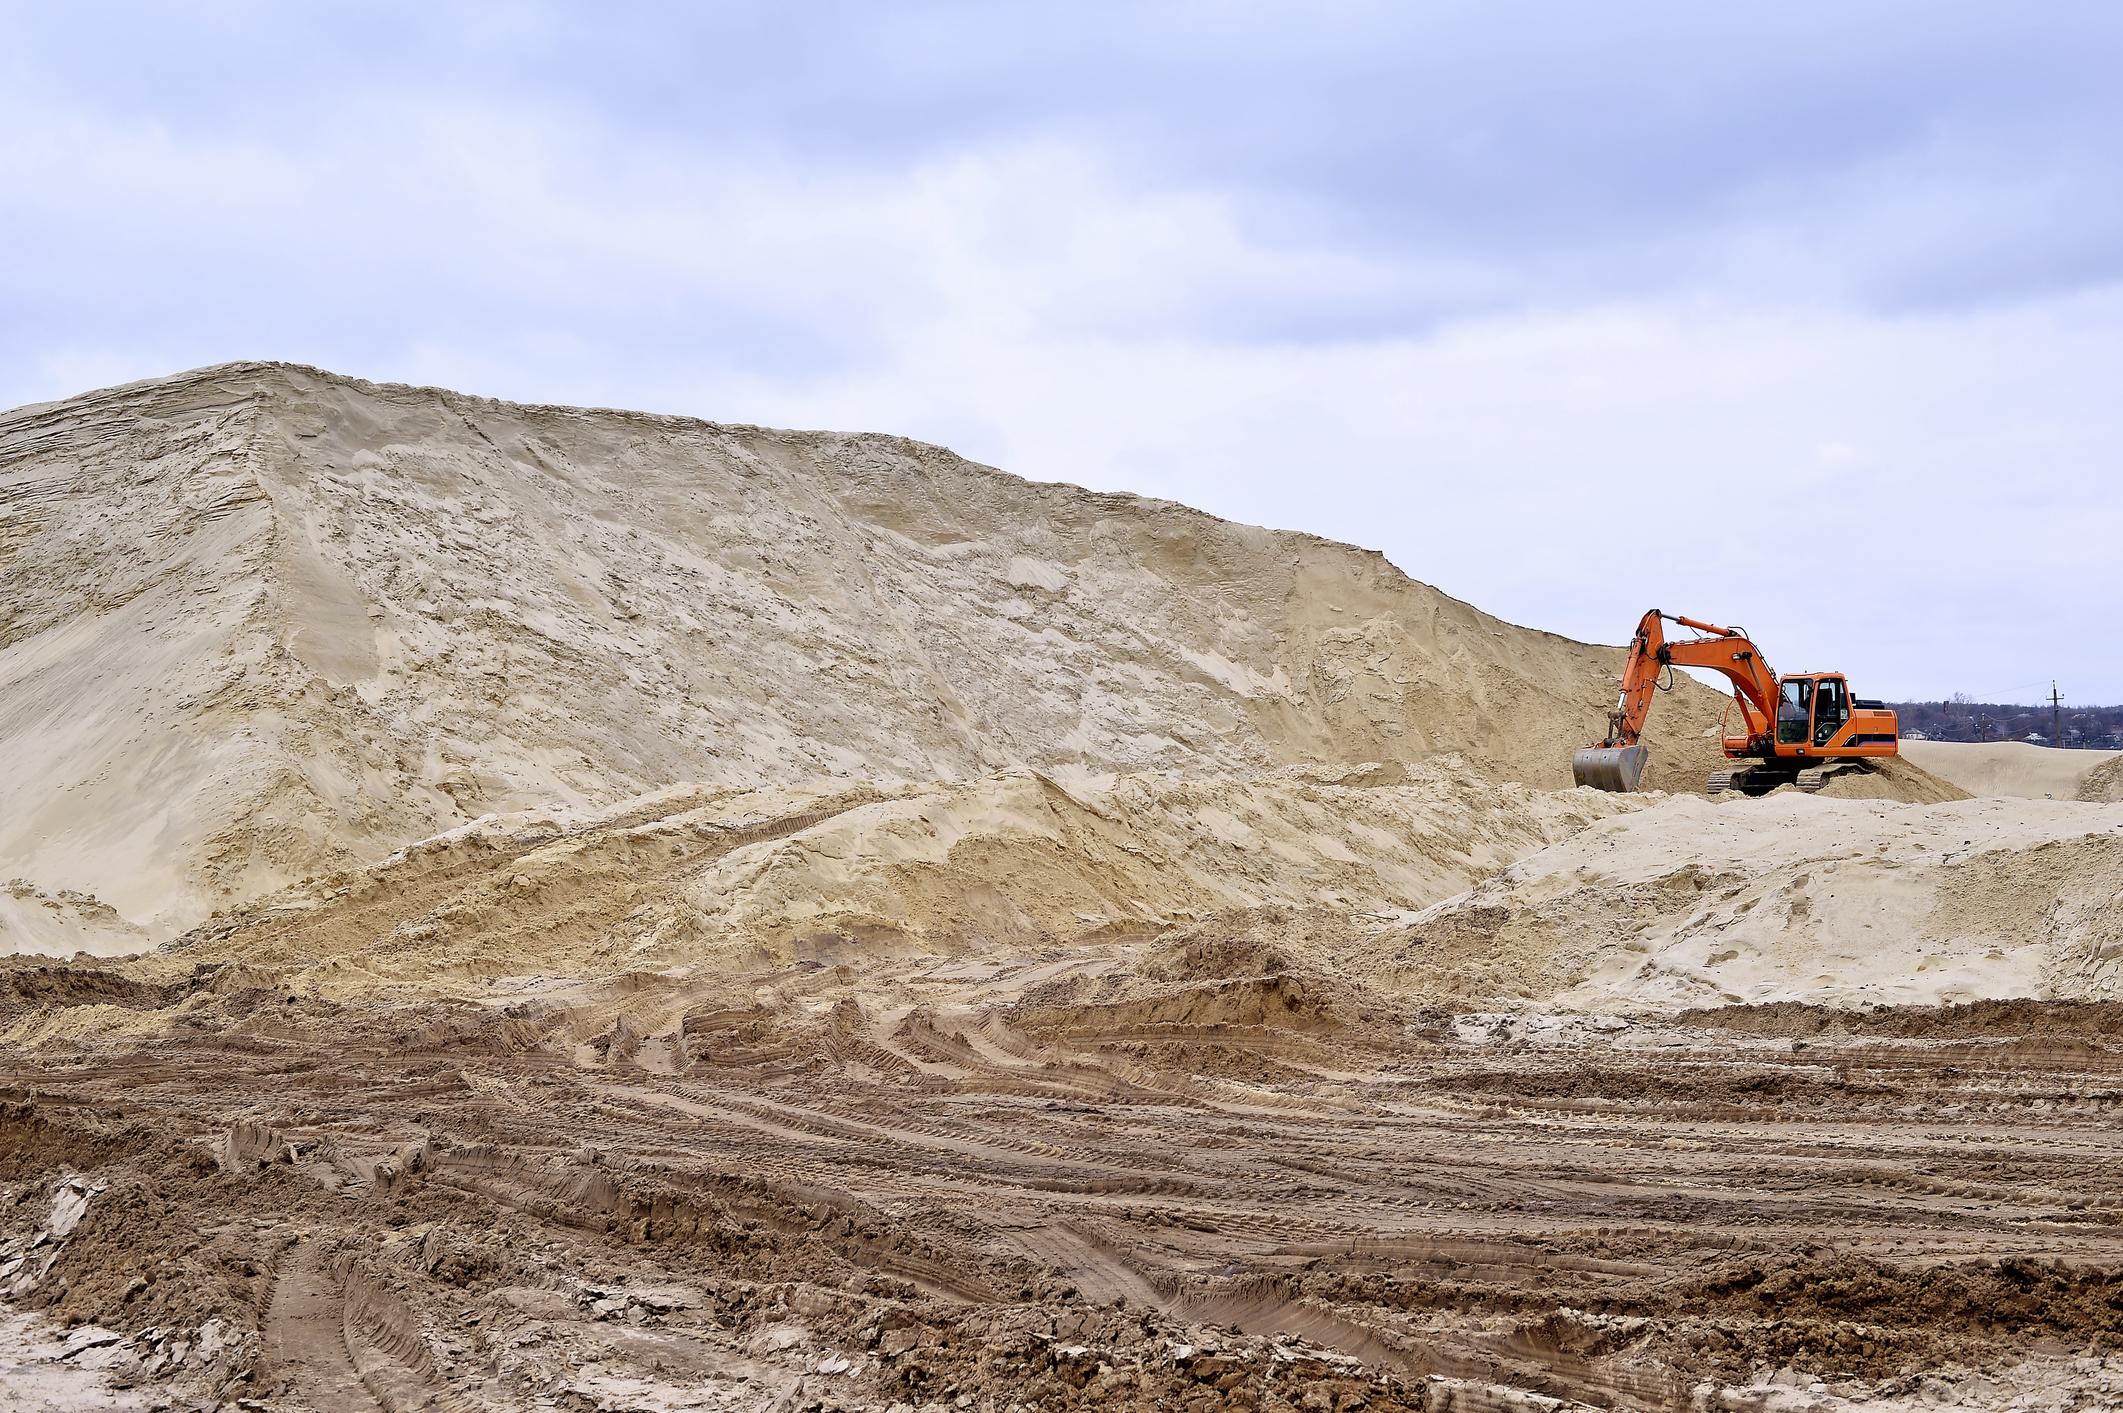 Excavator in sand mine